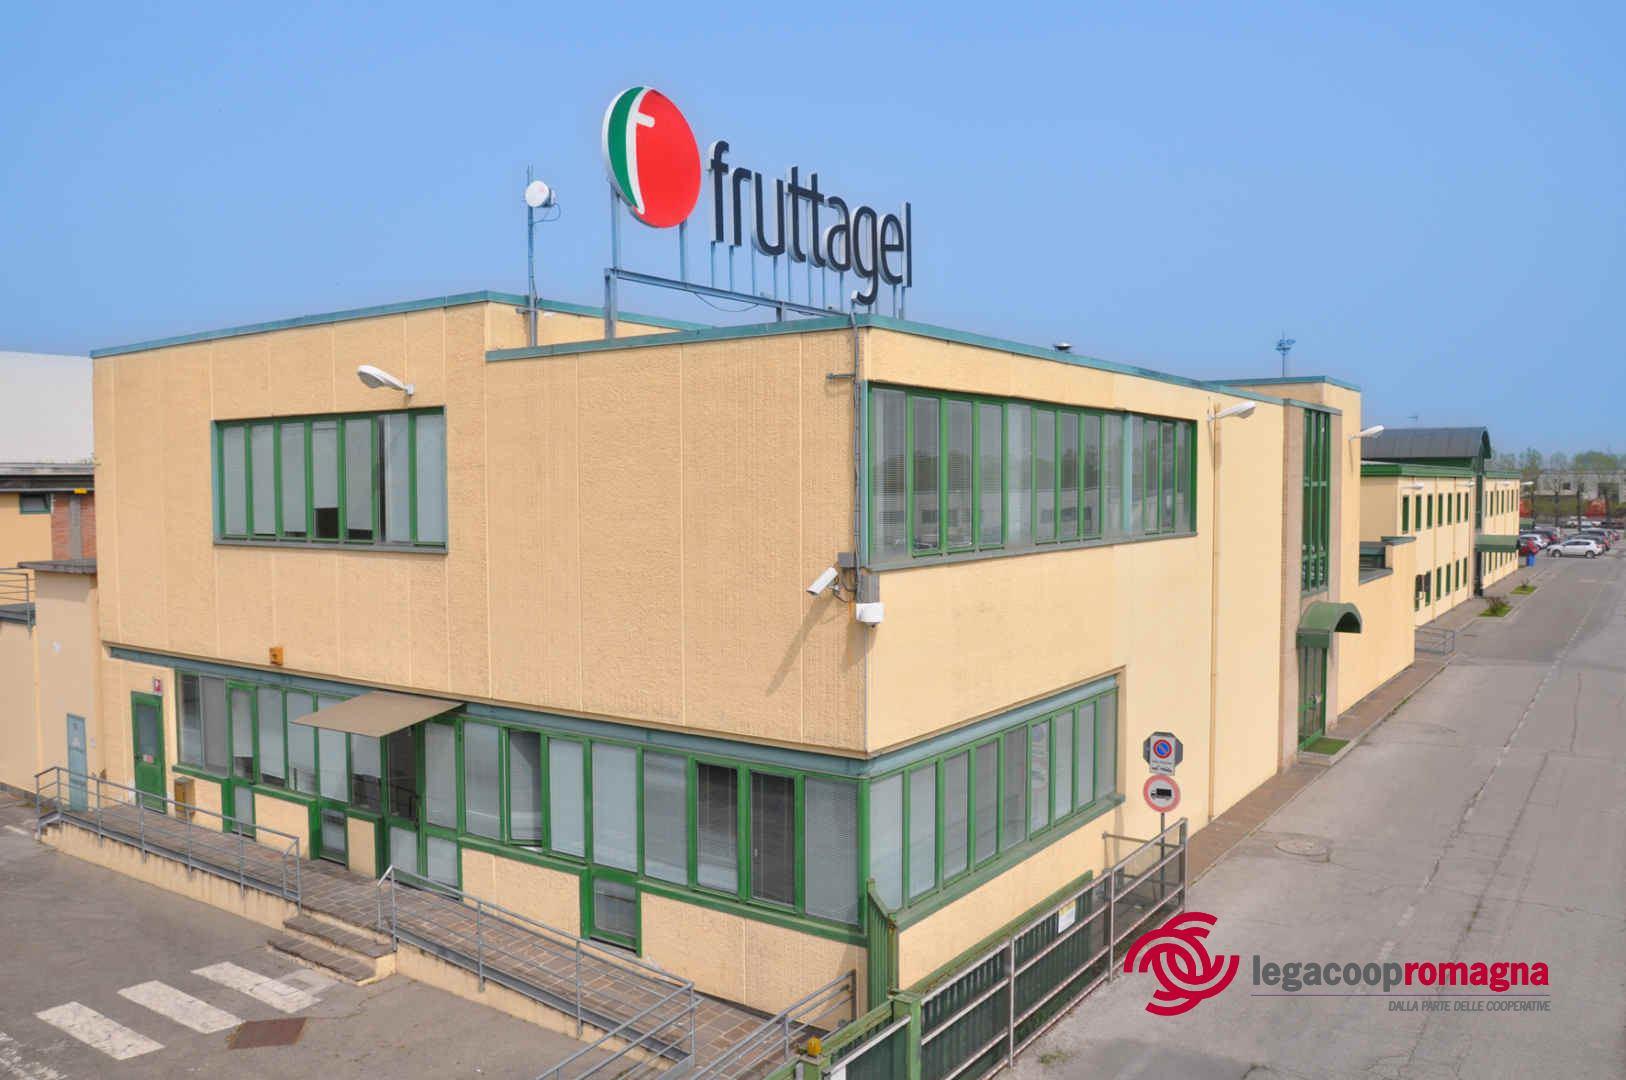 Fruttagel dona 40mila euro agli ospedali di Lugo e Ravenna